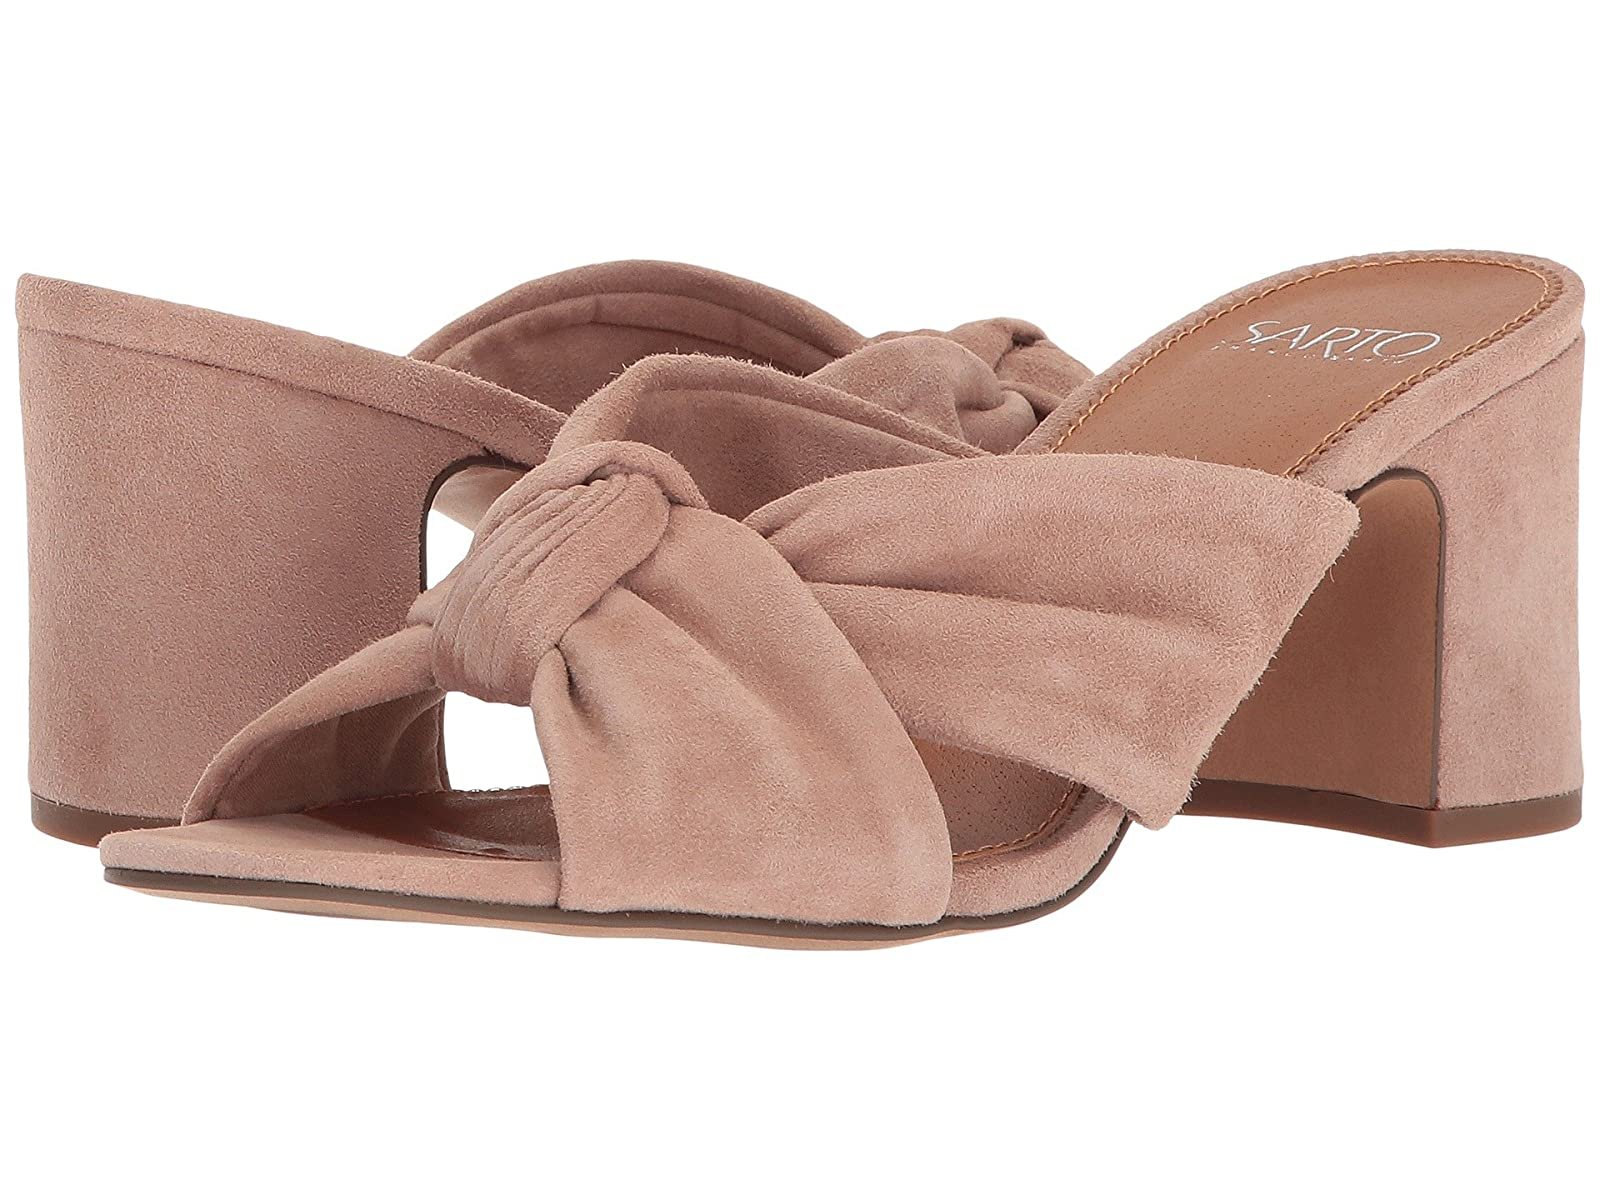 Franco Sarto Sala by SARTOCheap and distinctive eye-catching shoes